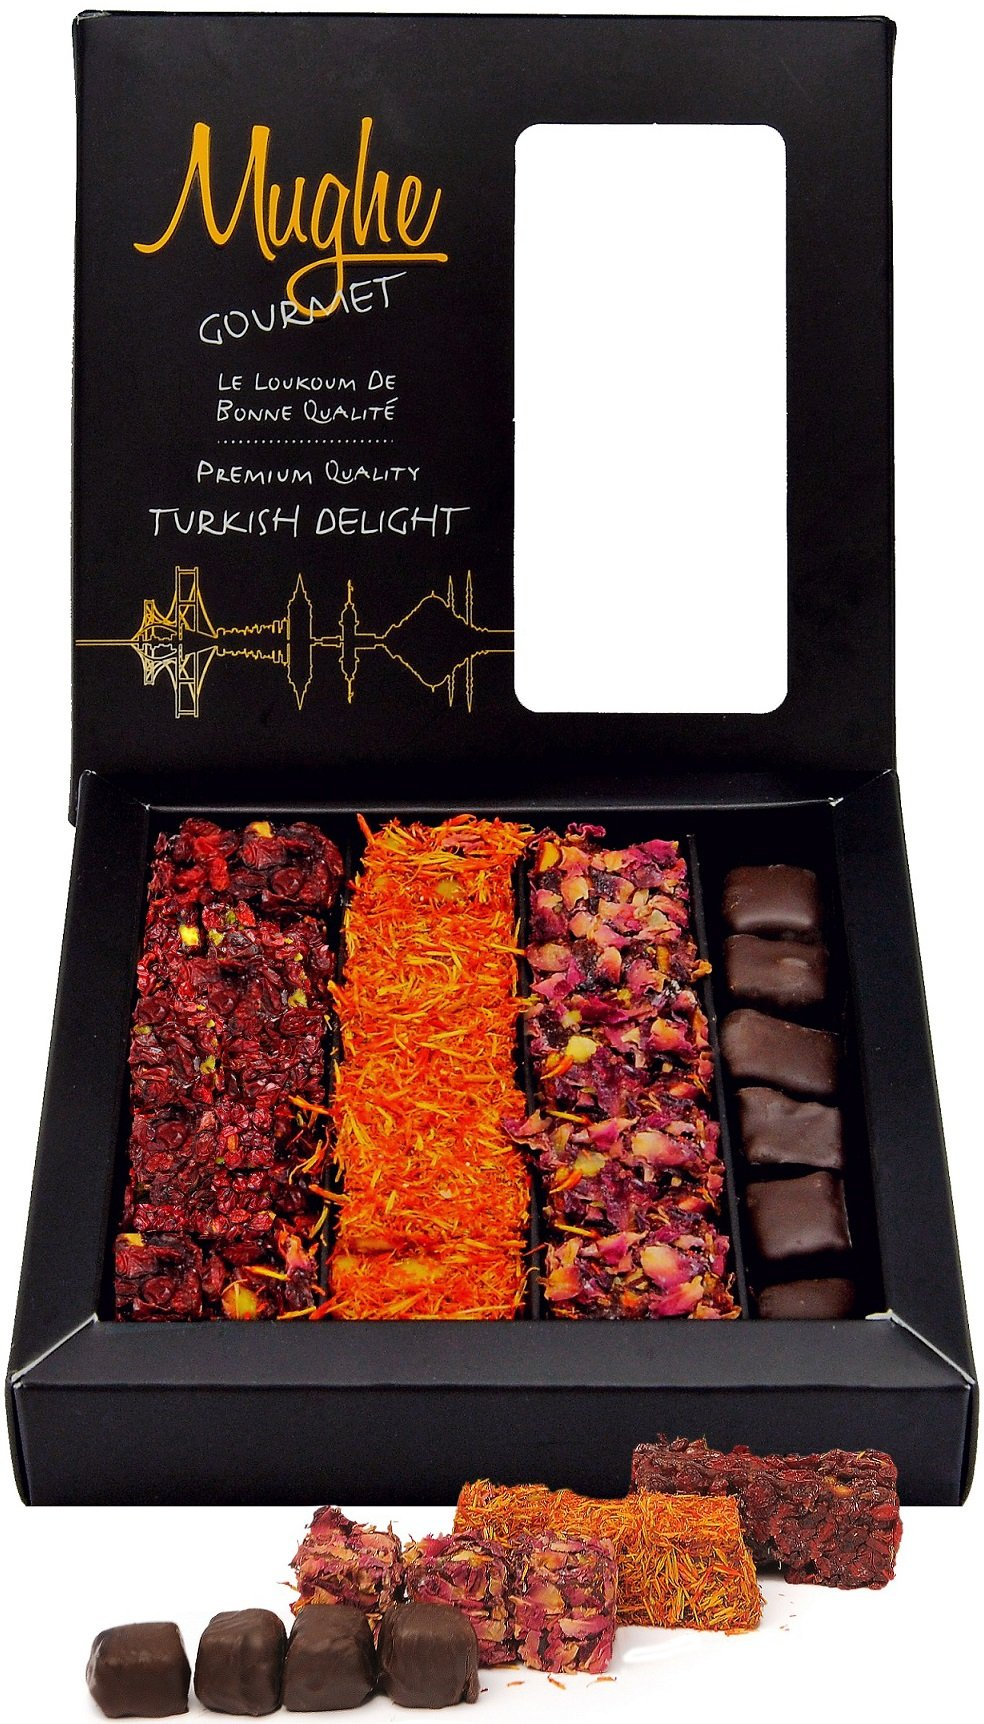 Luxury Turkish Delight Pistachio Assorted - 4 Varieties: Chocolate, Rose, Saffron, Pomegranate -Taste the Unique ORIGINAL Most Prestigious Turkish Delight Mix /Gourmet Lokum Gift Box (20-25 Pcs/13 Oz)